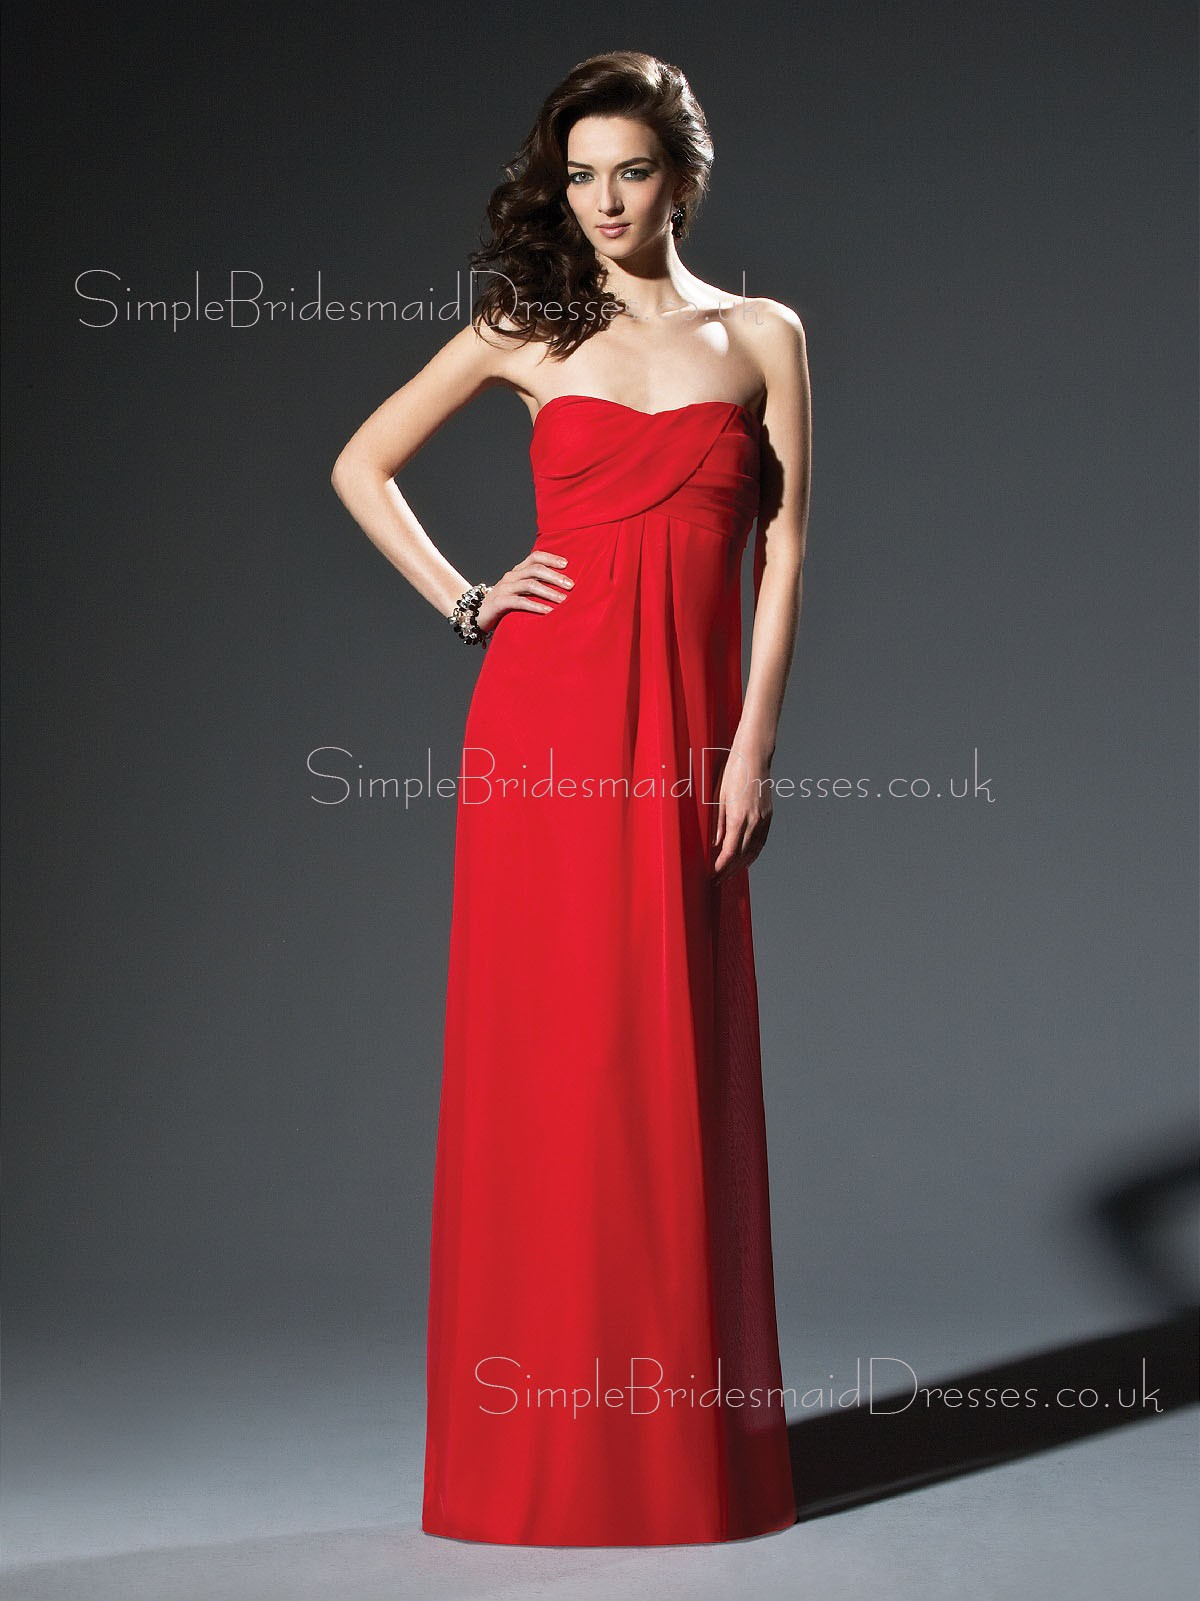 Sleeveless Backless Empire Red Sweetheart Bridesmaid Dress